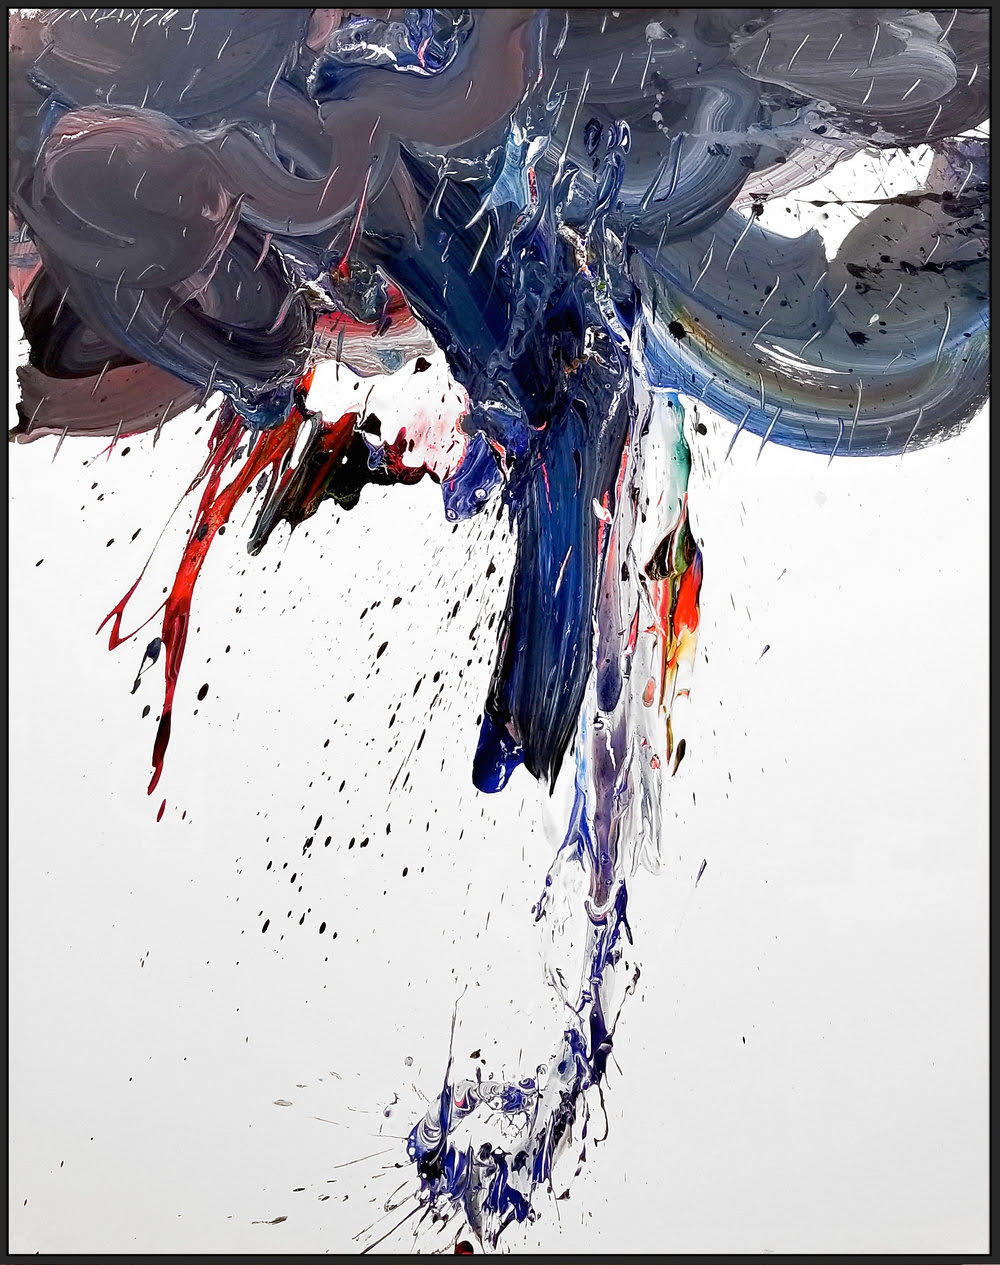 "Storm #7, 2018, acrylic on canvas, 60"" x 48"" (152.4 x 122 cm)"